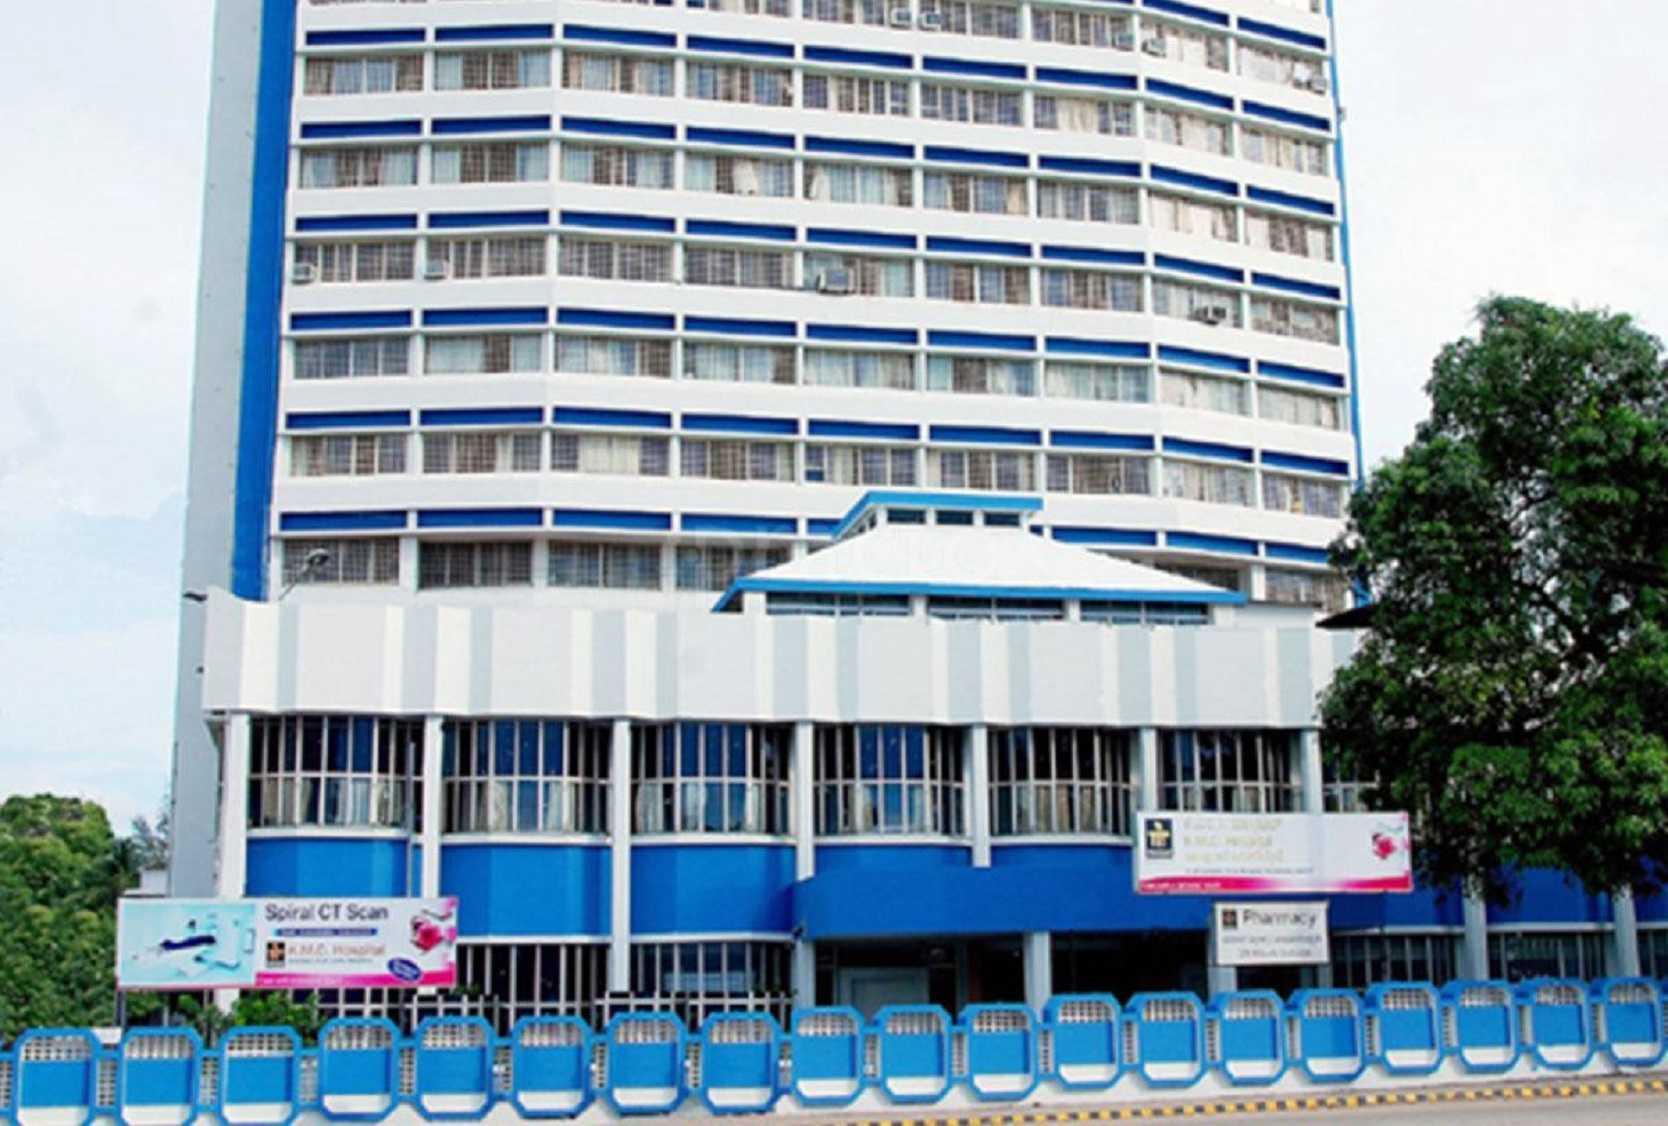 Kmc hospital mangalore 1484032889 58748b79022c3